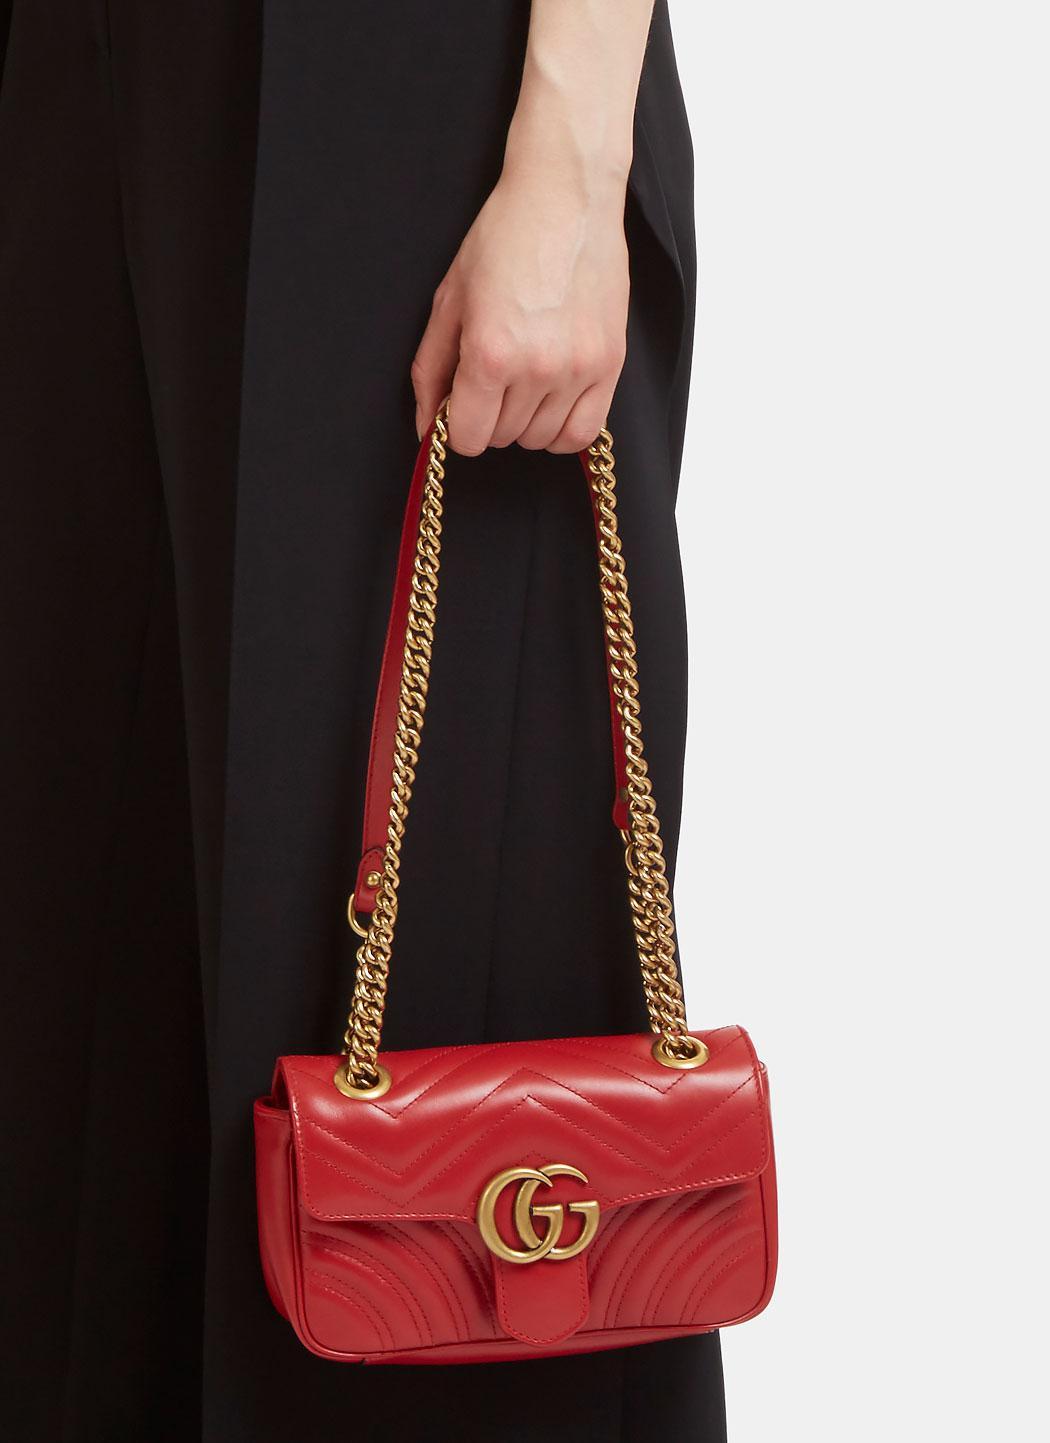 99a0de2a98d4 Gucci Gg Marmont Matelassé Mini Chain Shoulder Bag In Red in Red - Lyst